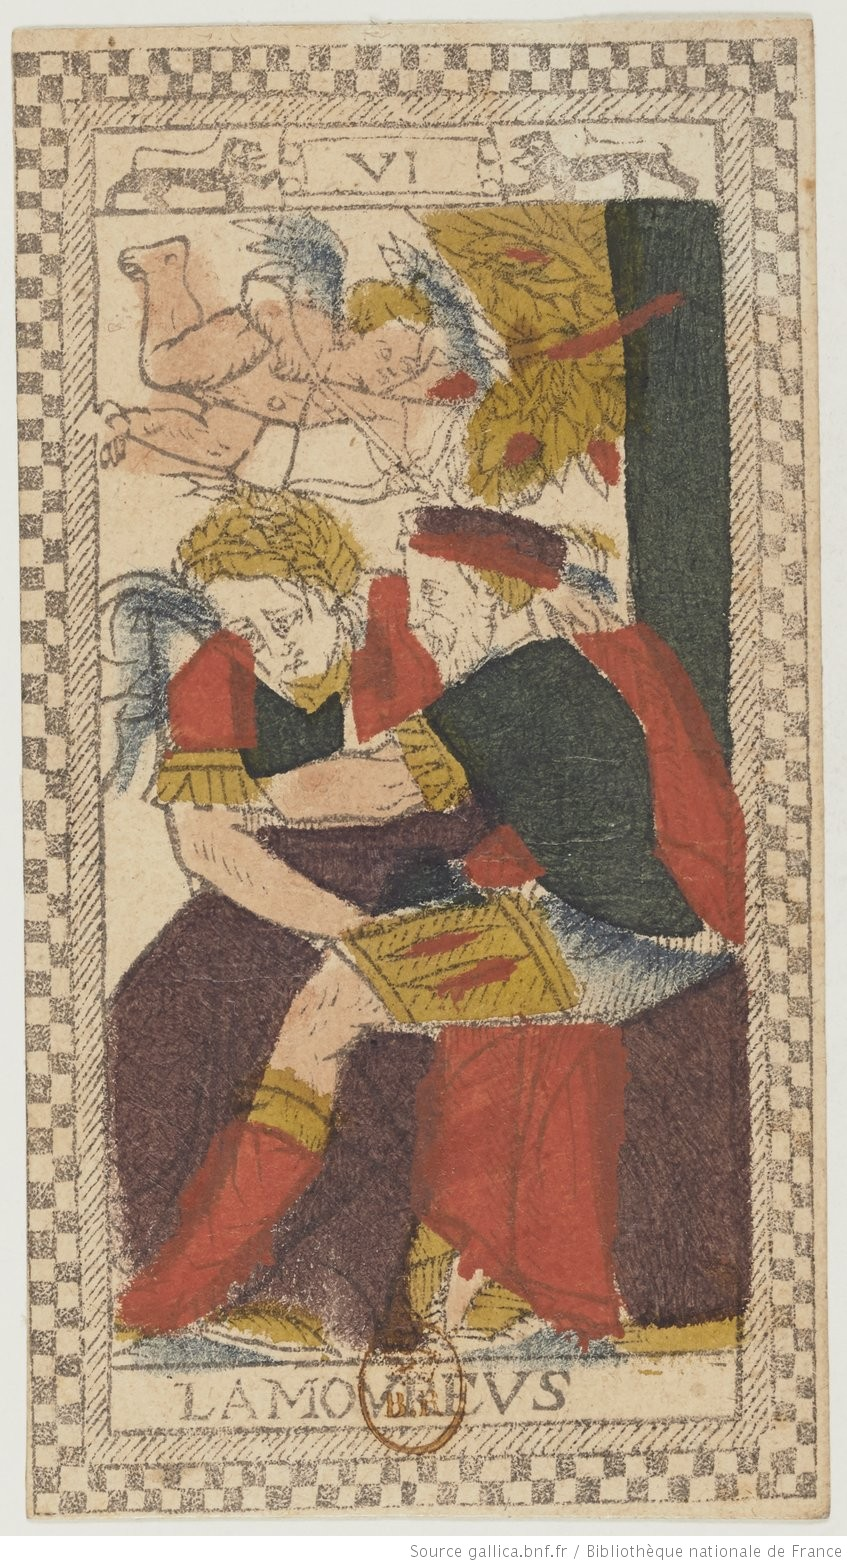 http://gallica.bnf.fr/ark:/12148/btv1b105109624/f11.highres